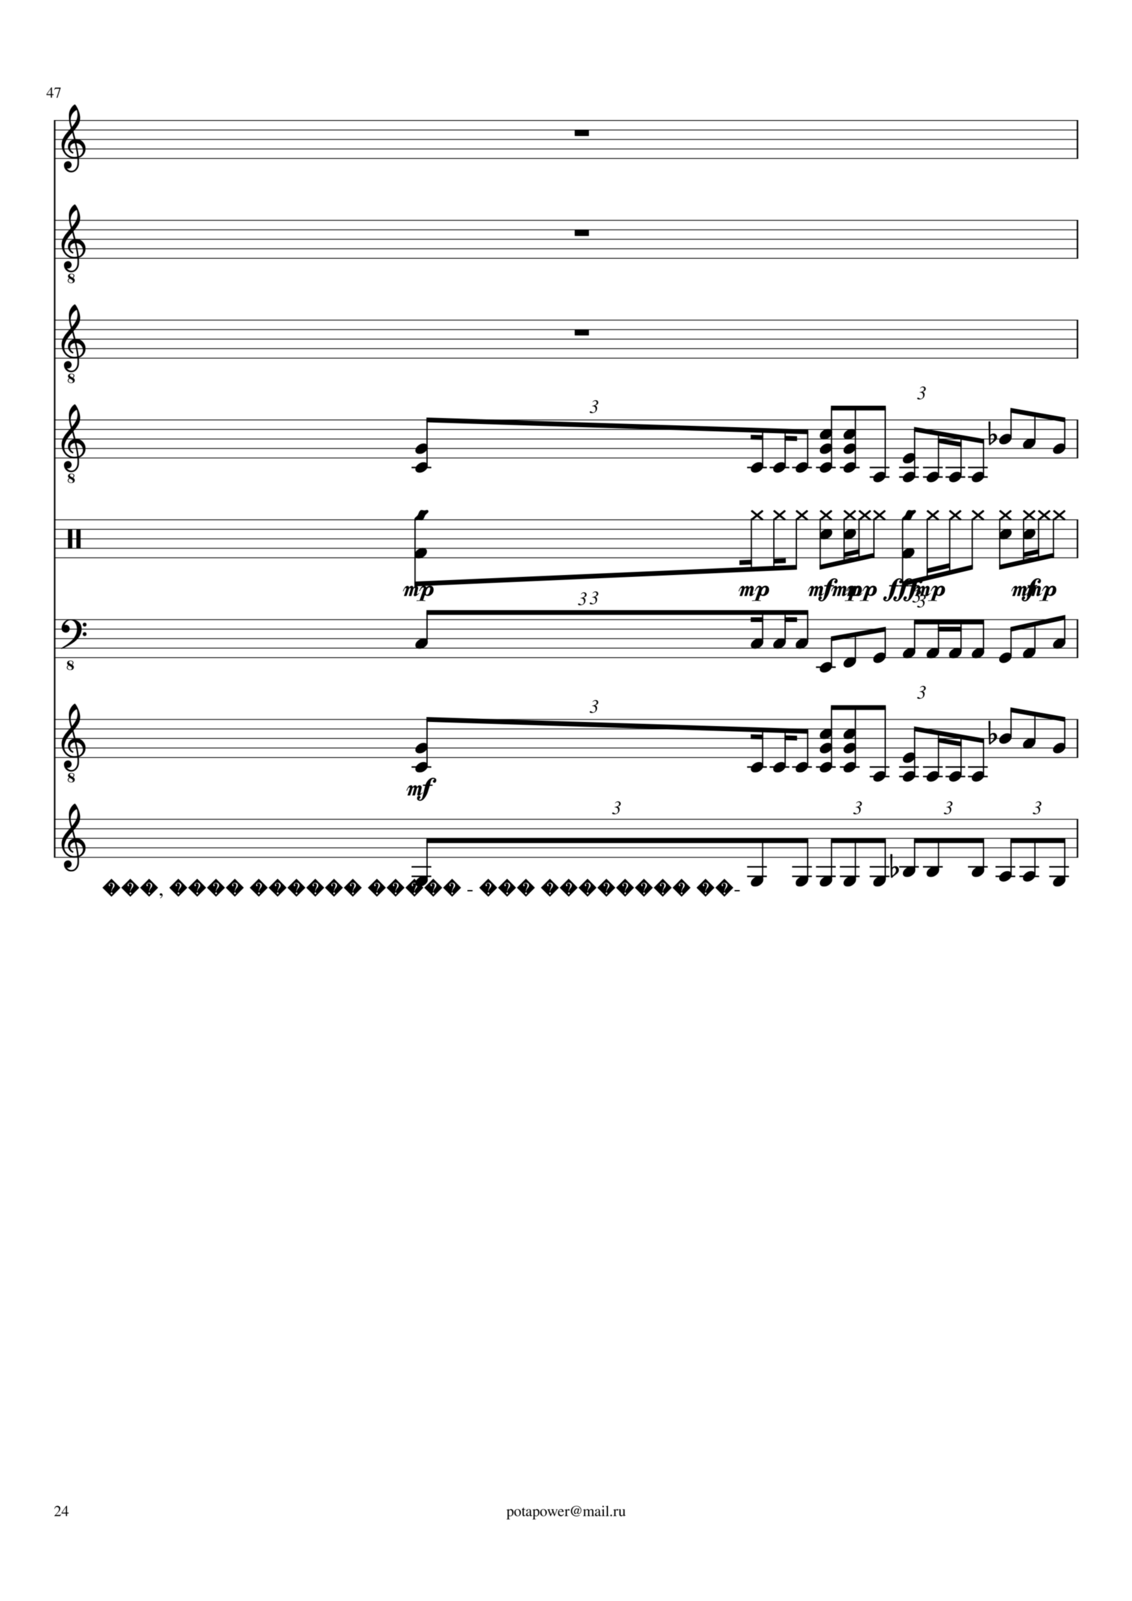 Korolevstvo slez slide, Image 24